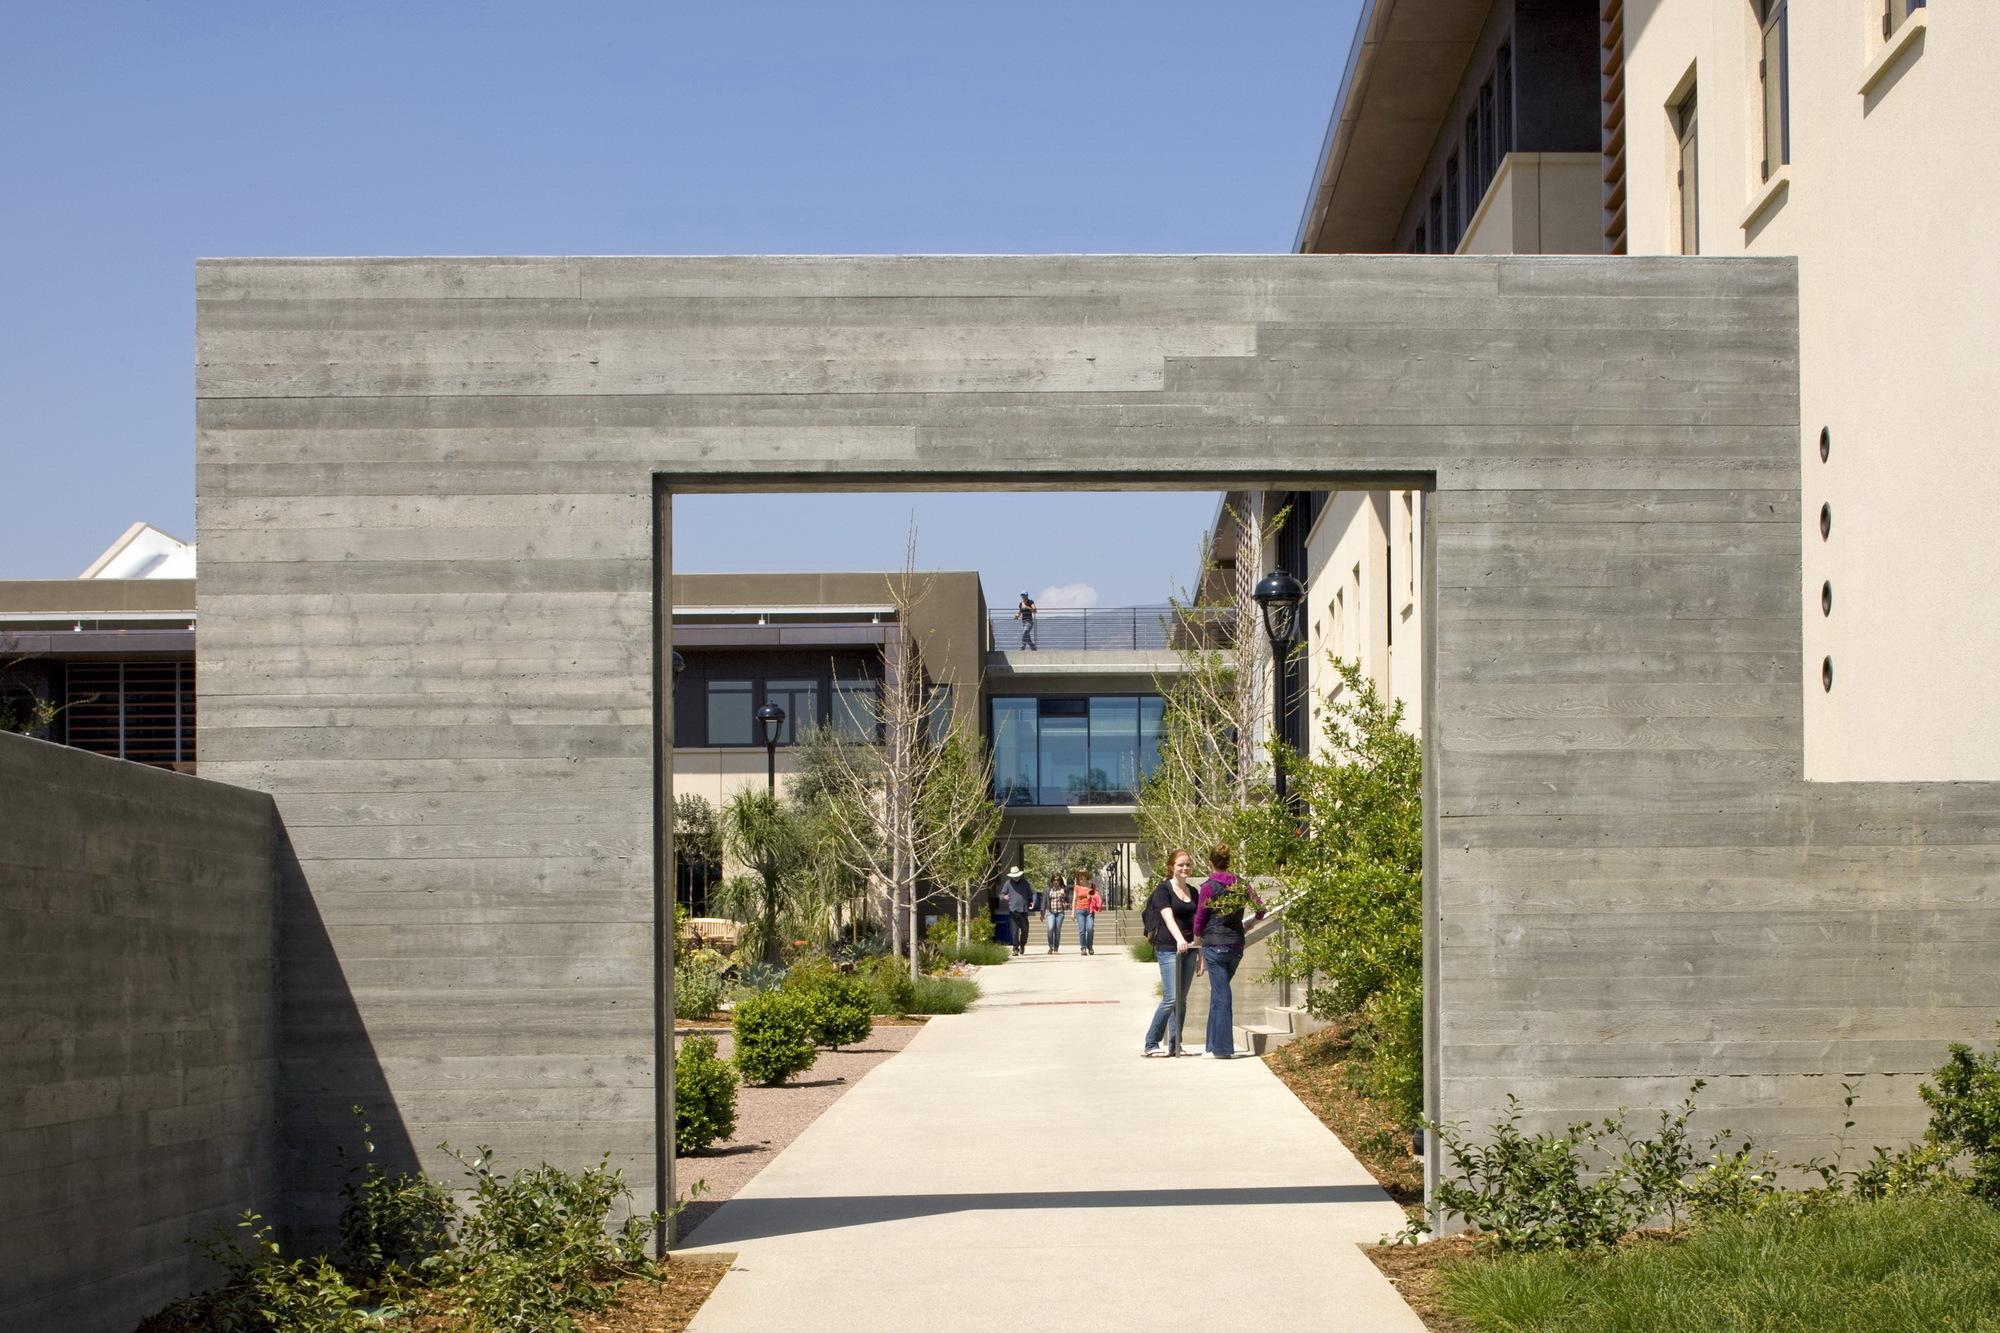 Pomona College Student Housing Ehrlich Yanai Rhee Chaney